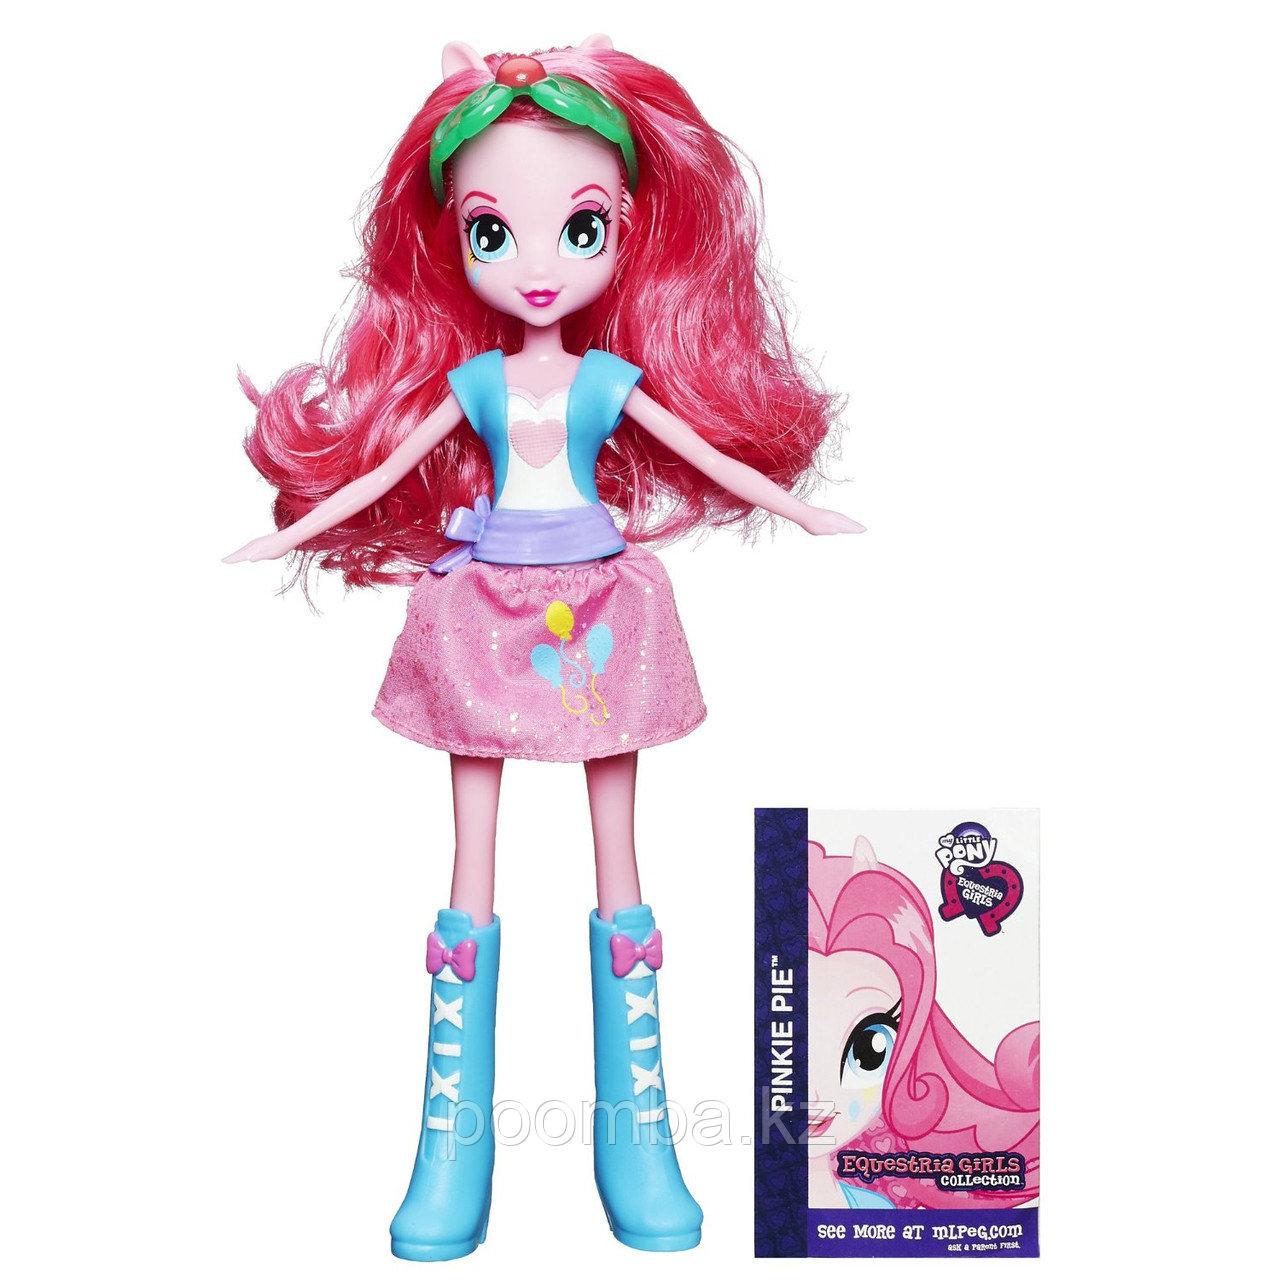 Кукла My Little Pony Equestria Girls - Пинки Пай в маске